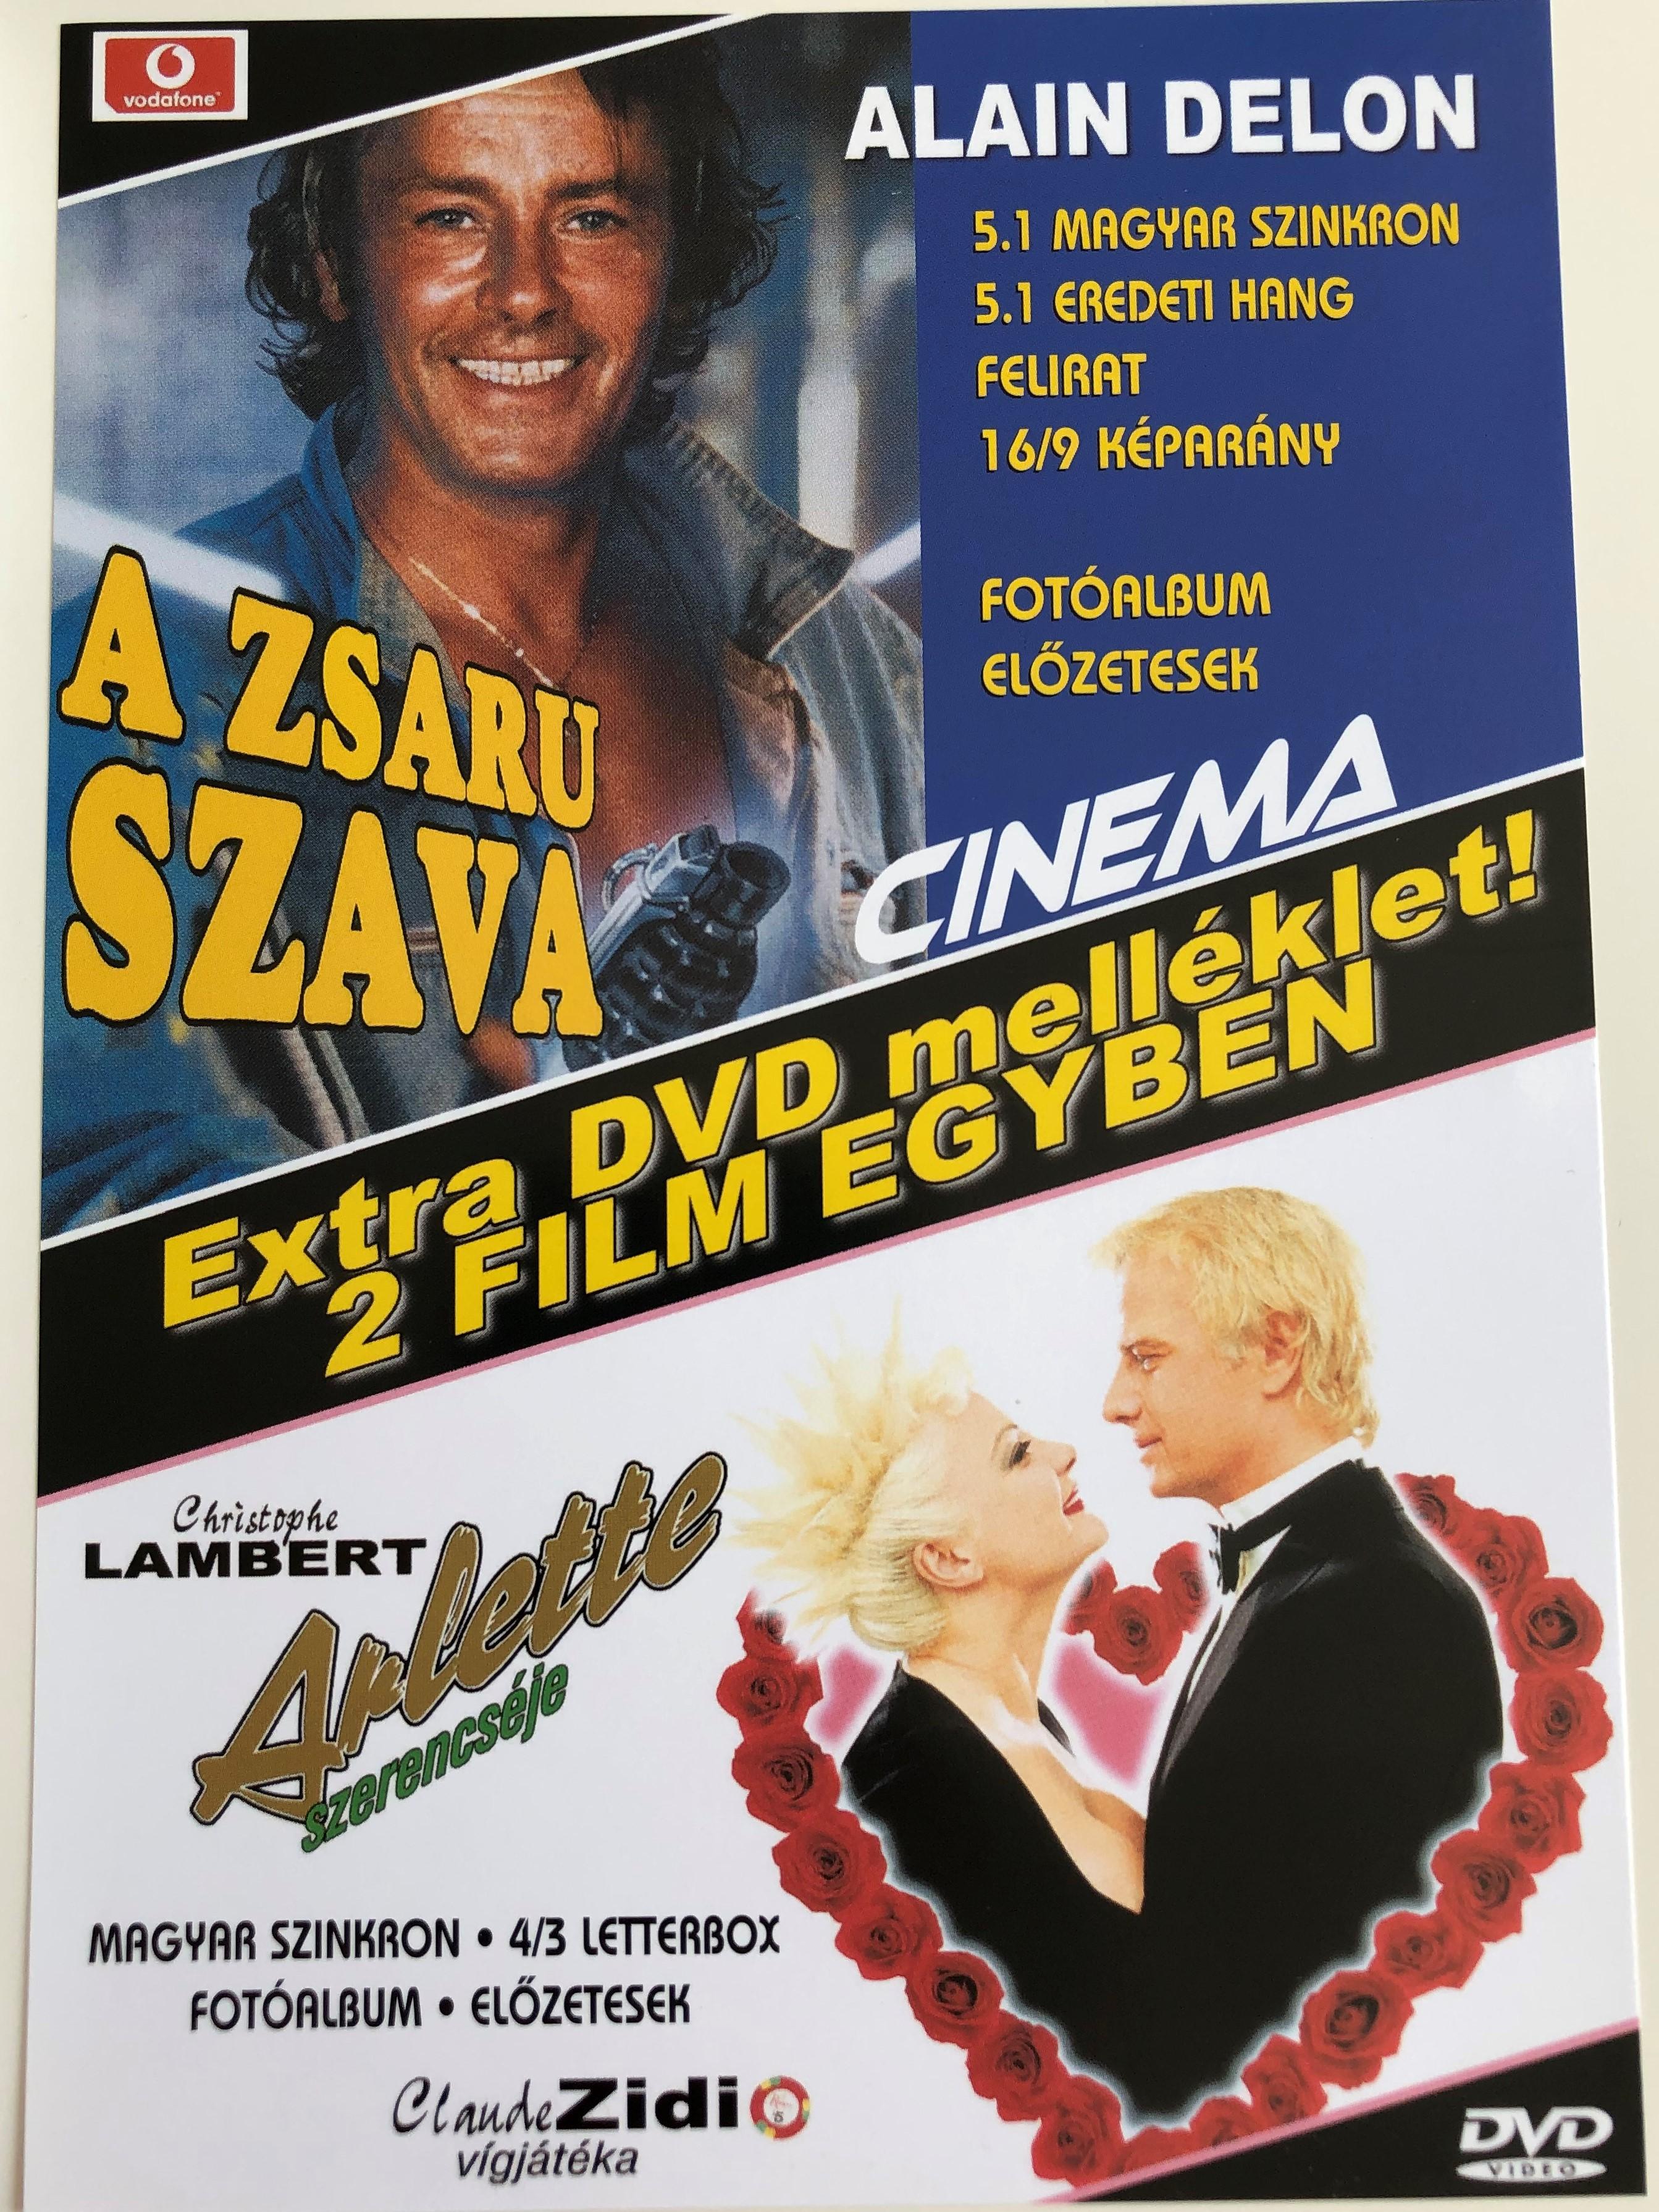 parole-de-flic-dvd-1985-a-zsaru-szava-directed-by-jose-pinheiro-starring-alain-delon-jacques-perrin-arlette-dvd-1997-arlette-szerencs-je-directed-by-claude-zidi-starring-christopher-lambert-josiane-balasko-2-.jpg